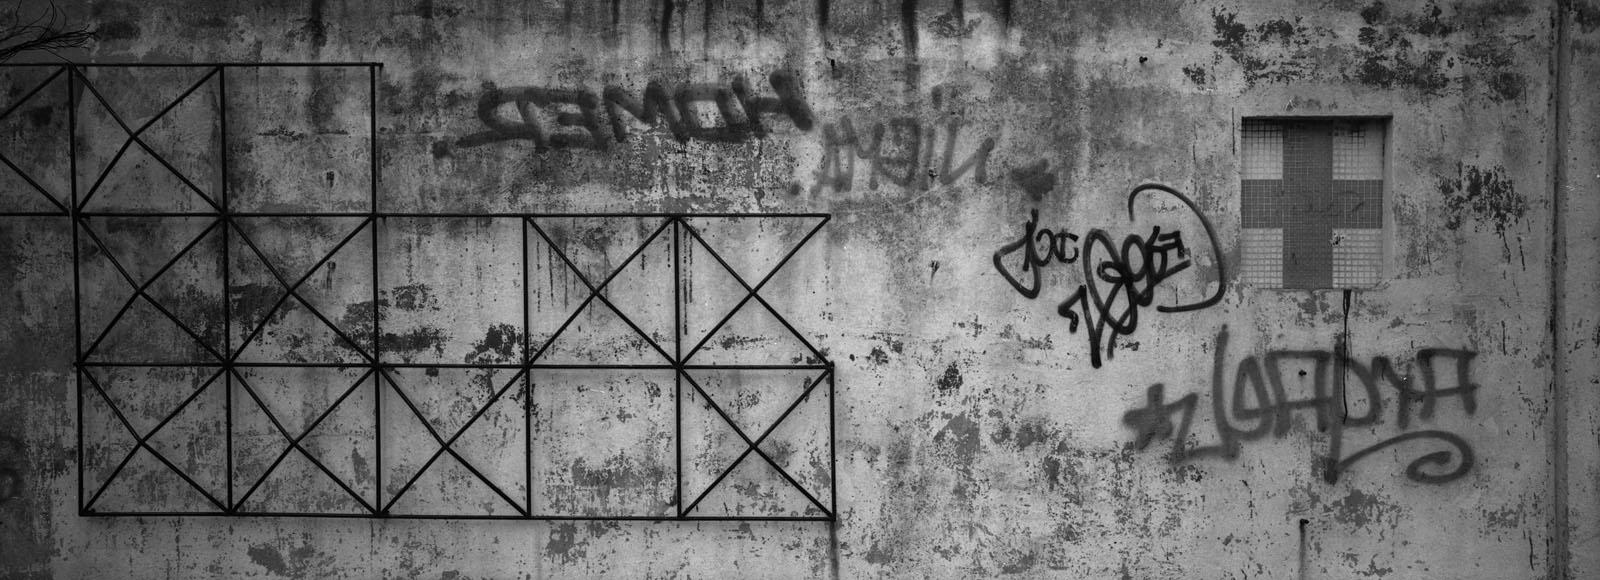 Art and Documentary Photography - Loading 010_Marseille___Fabio_Sgroi.jpg